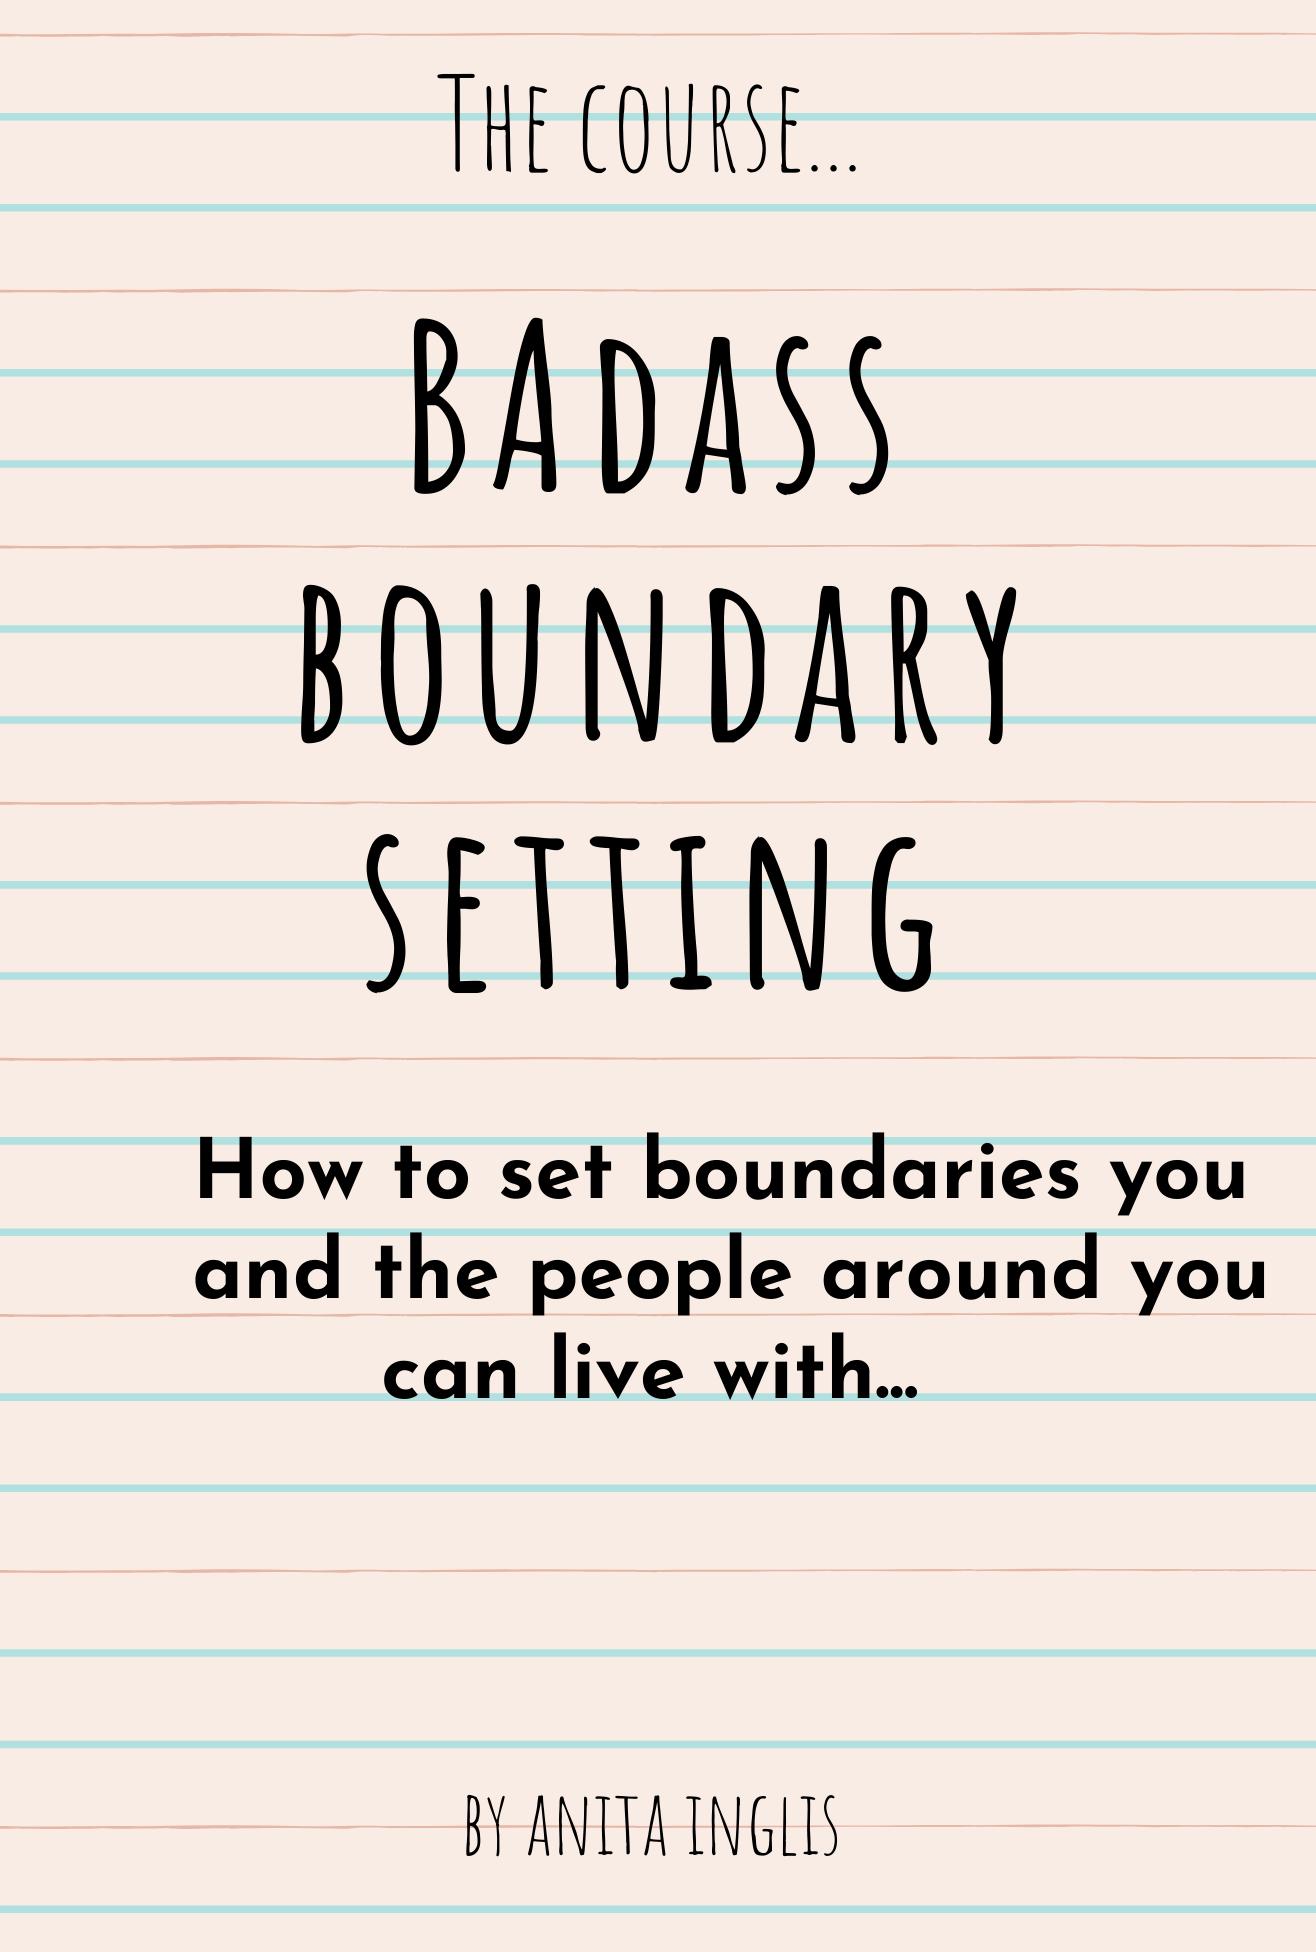 BAdass boundary settingpdf